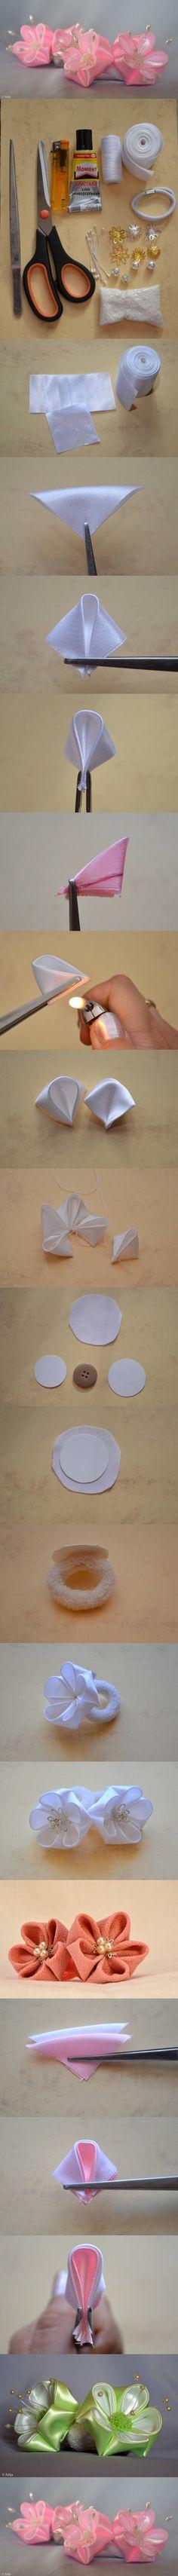 DIY Round Petals Ribbon Flower